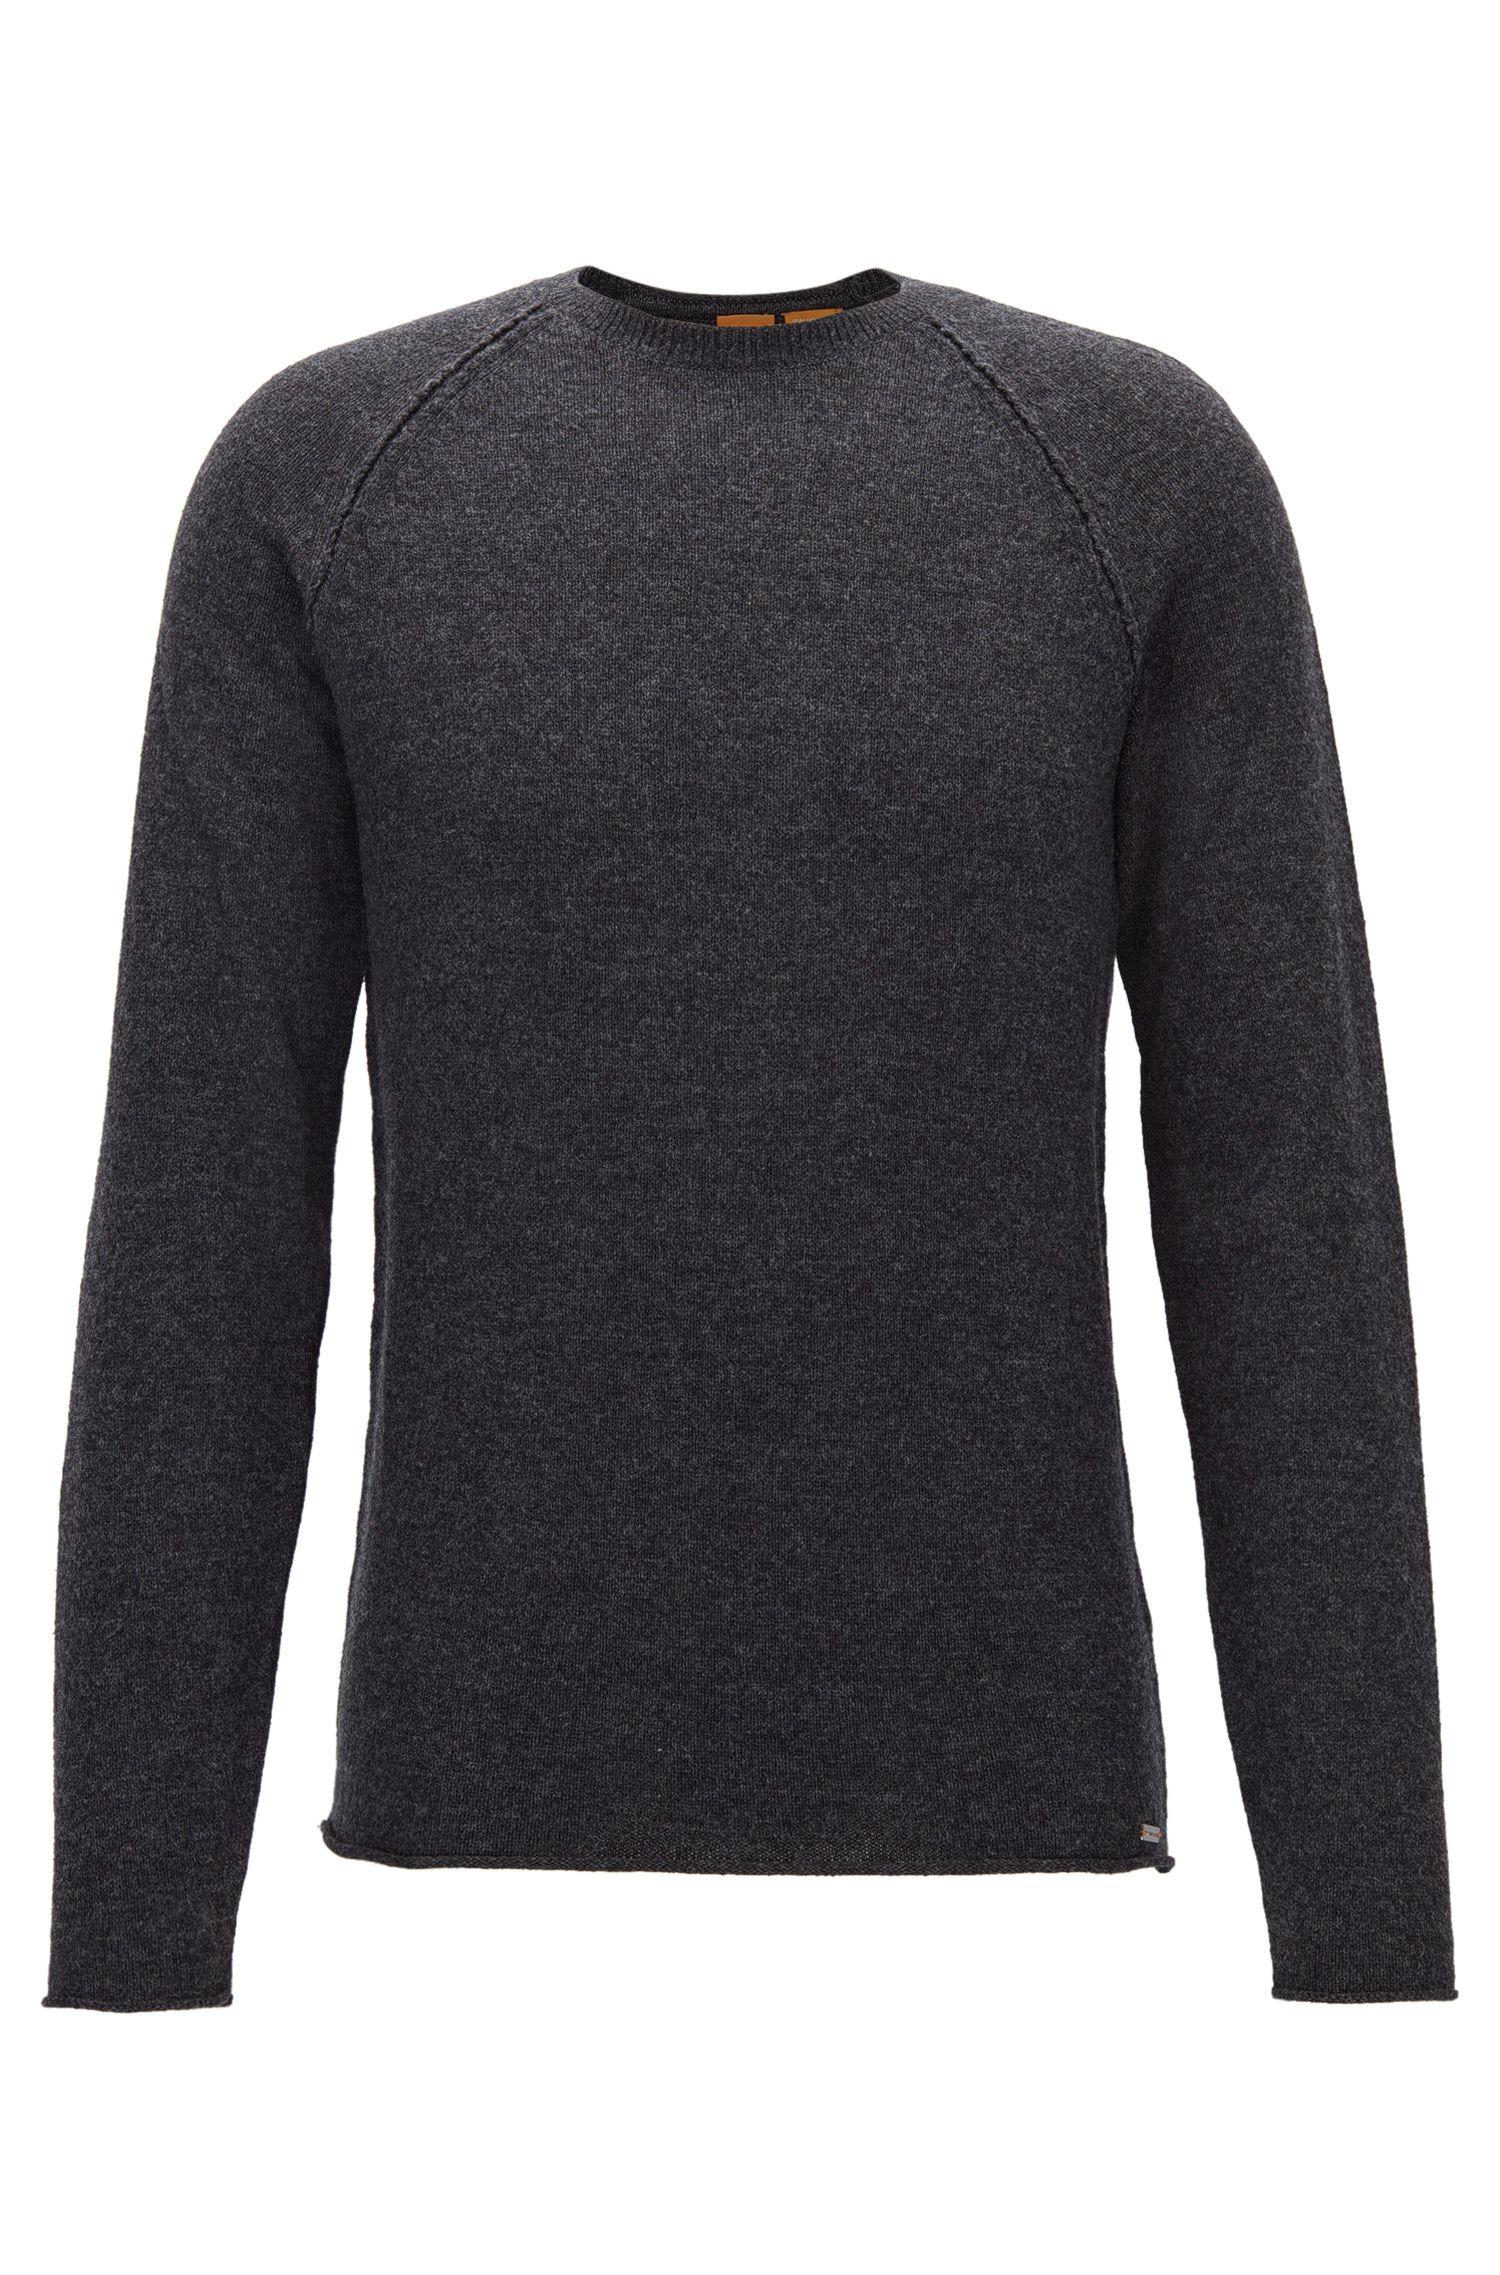 Wool-Cotton Blend Sweater   Kohedge